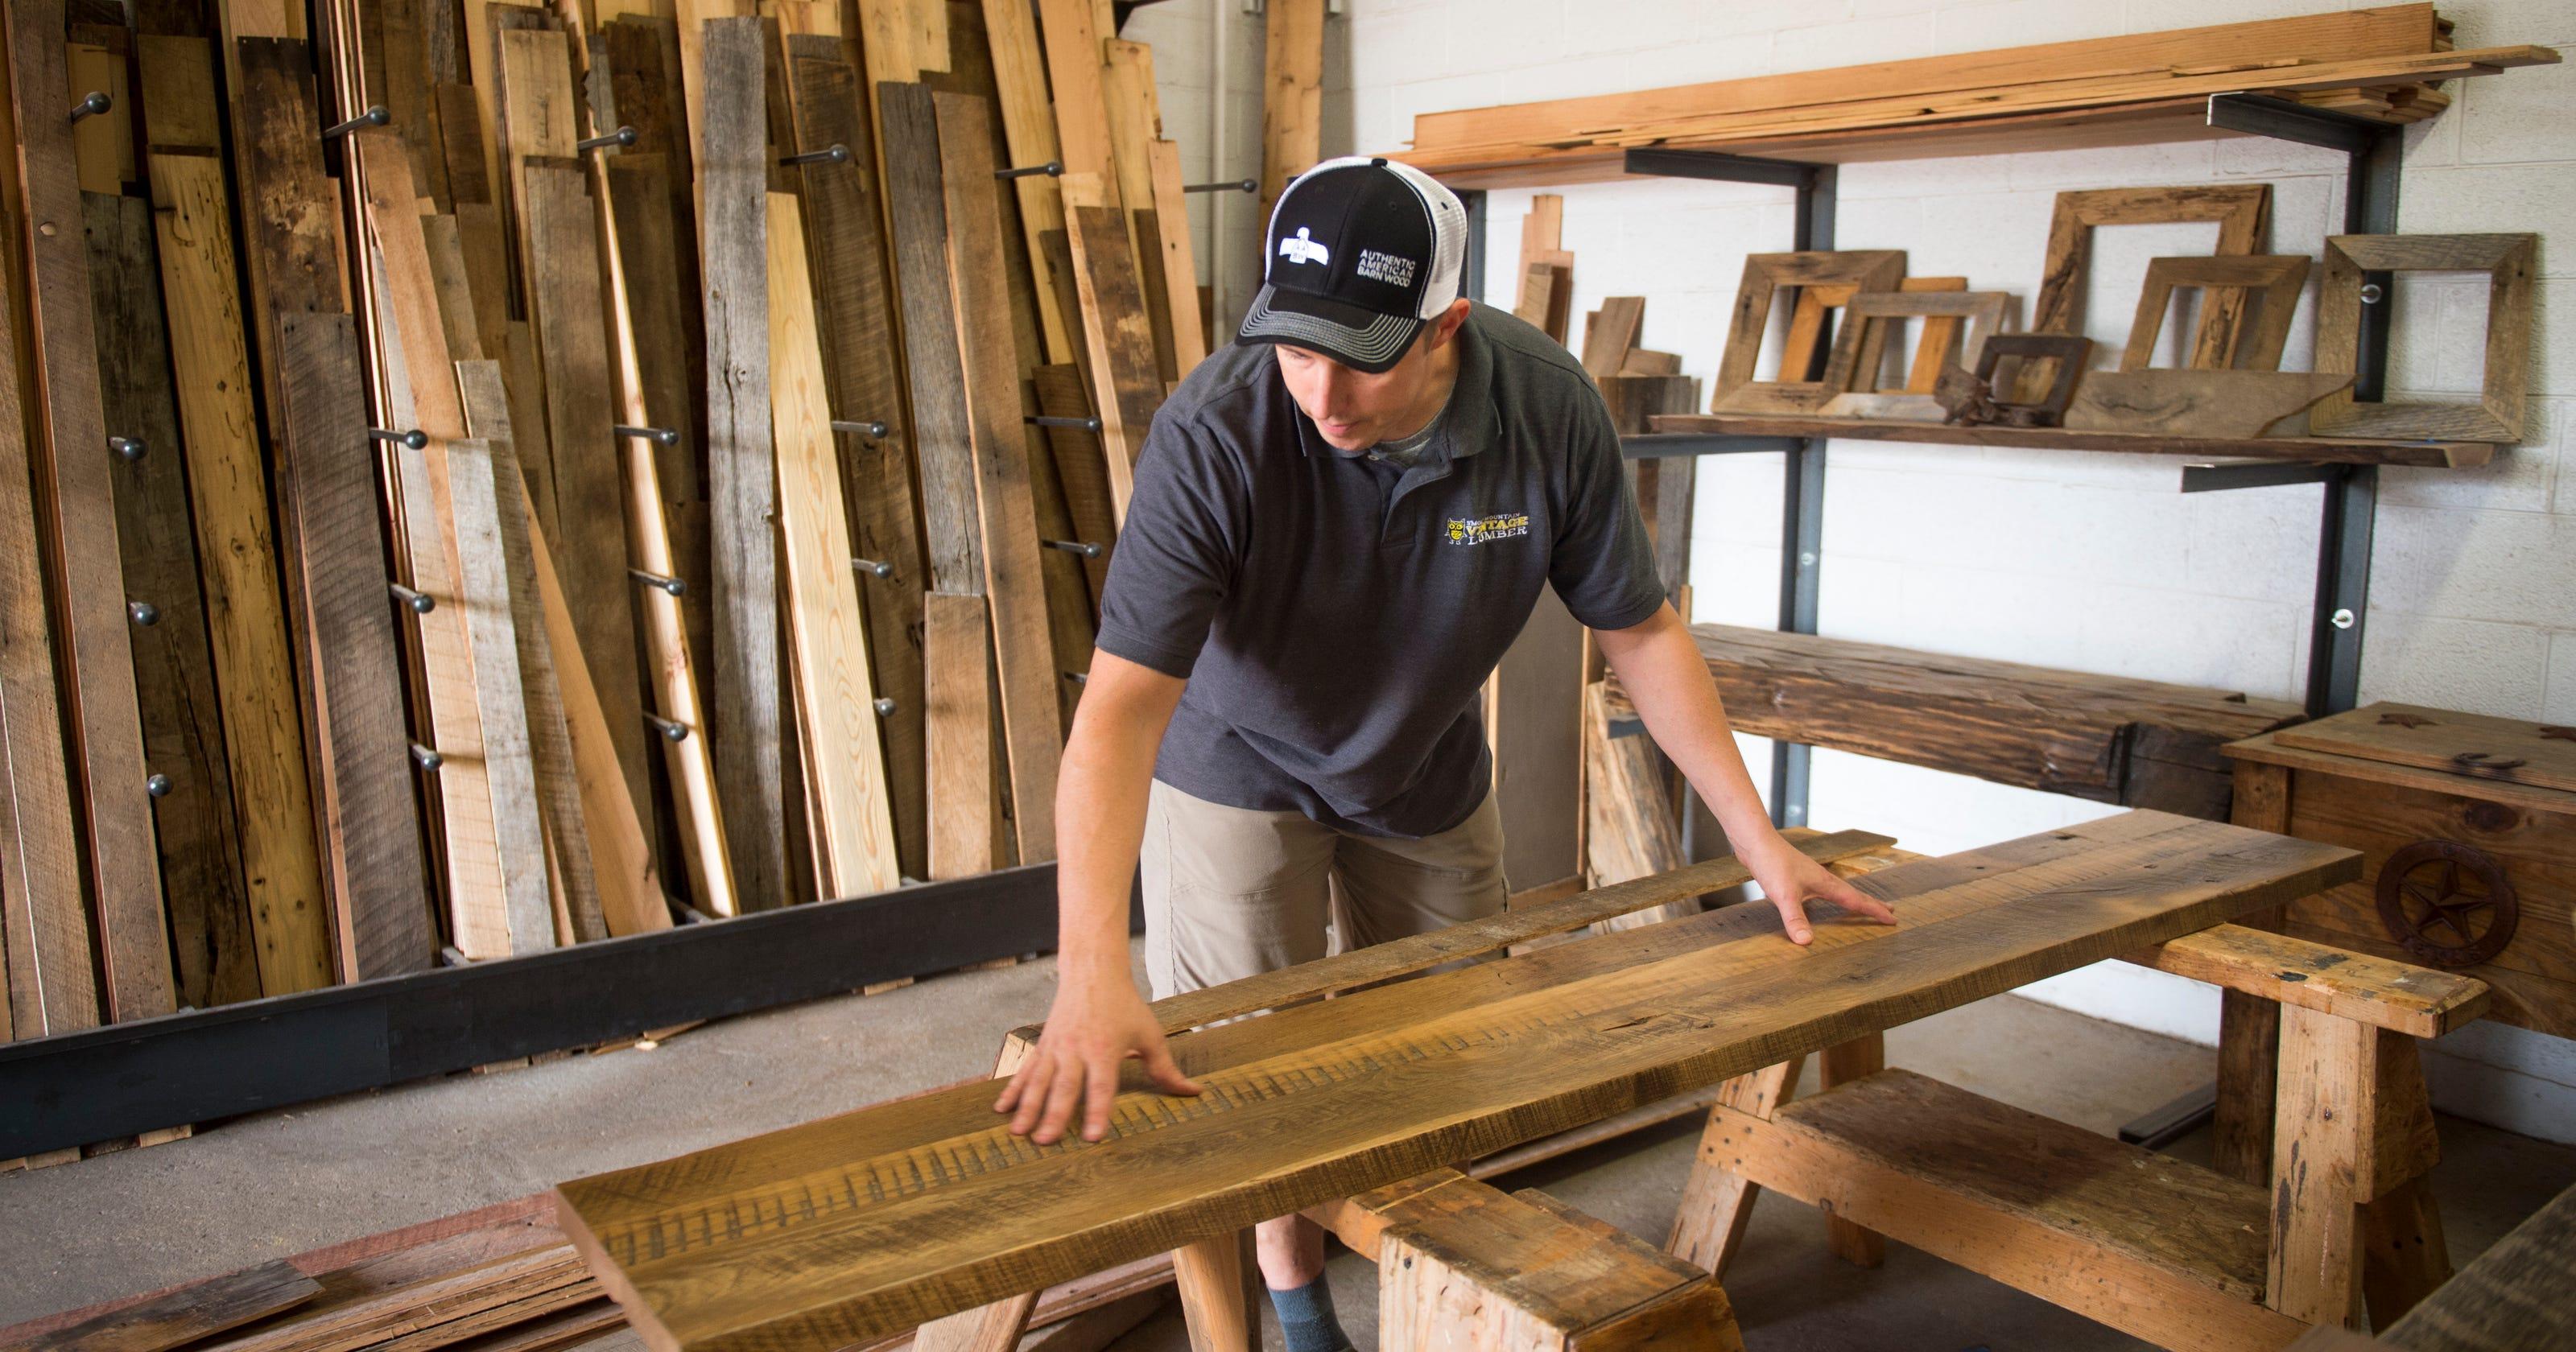 Smoky Mountain Vintage Lumber Creates Custom Furniture From Reclaimed Wood